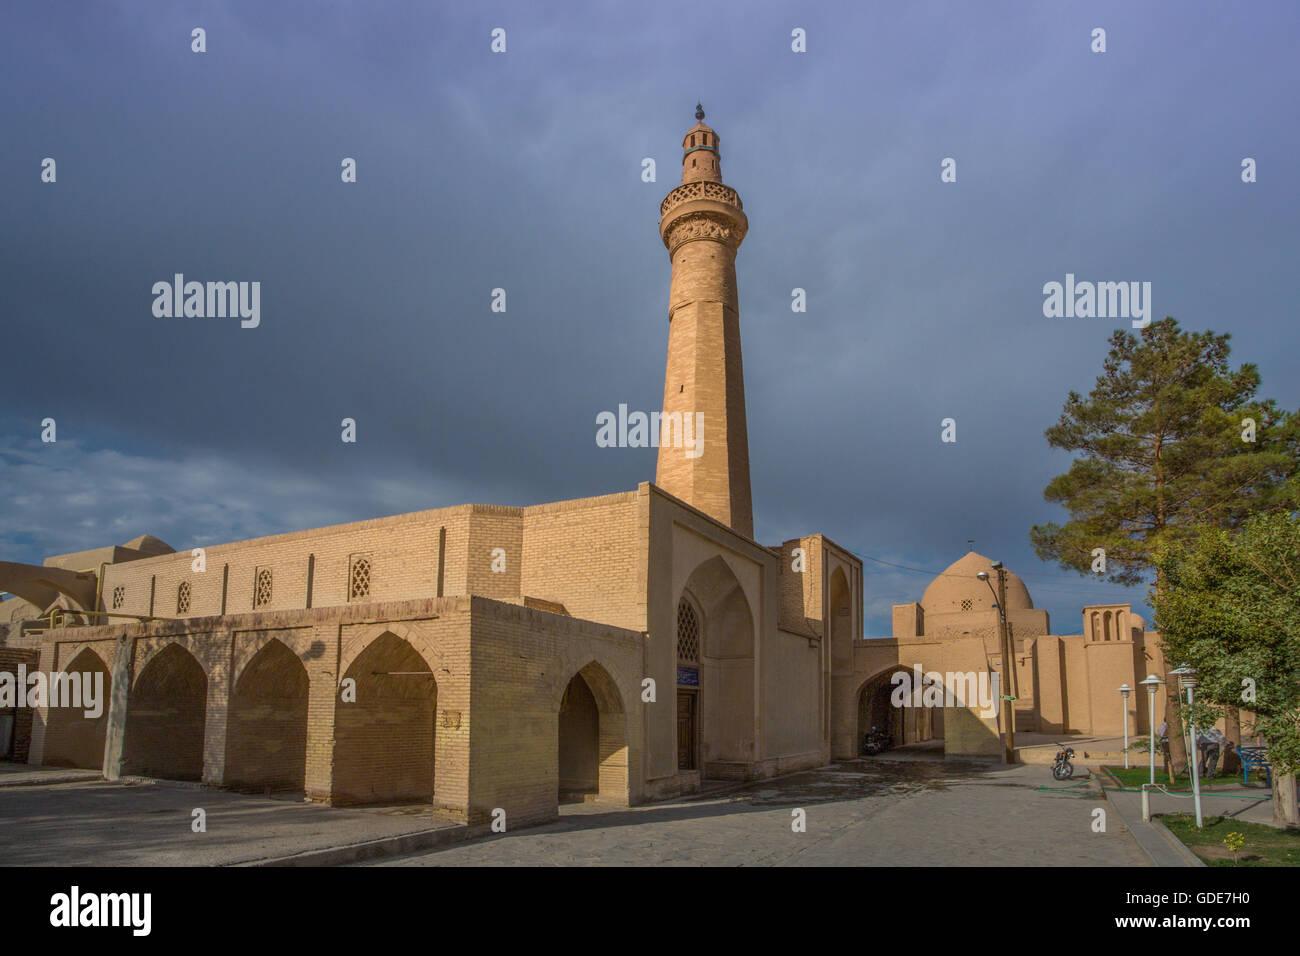 Iran,Naein City,Jami Masjid Mosque,10th century. Stock Photo